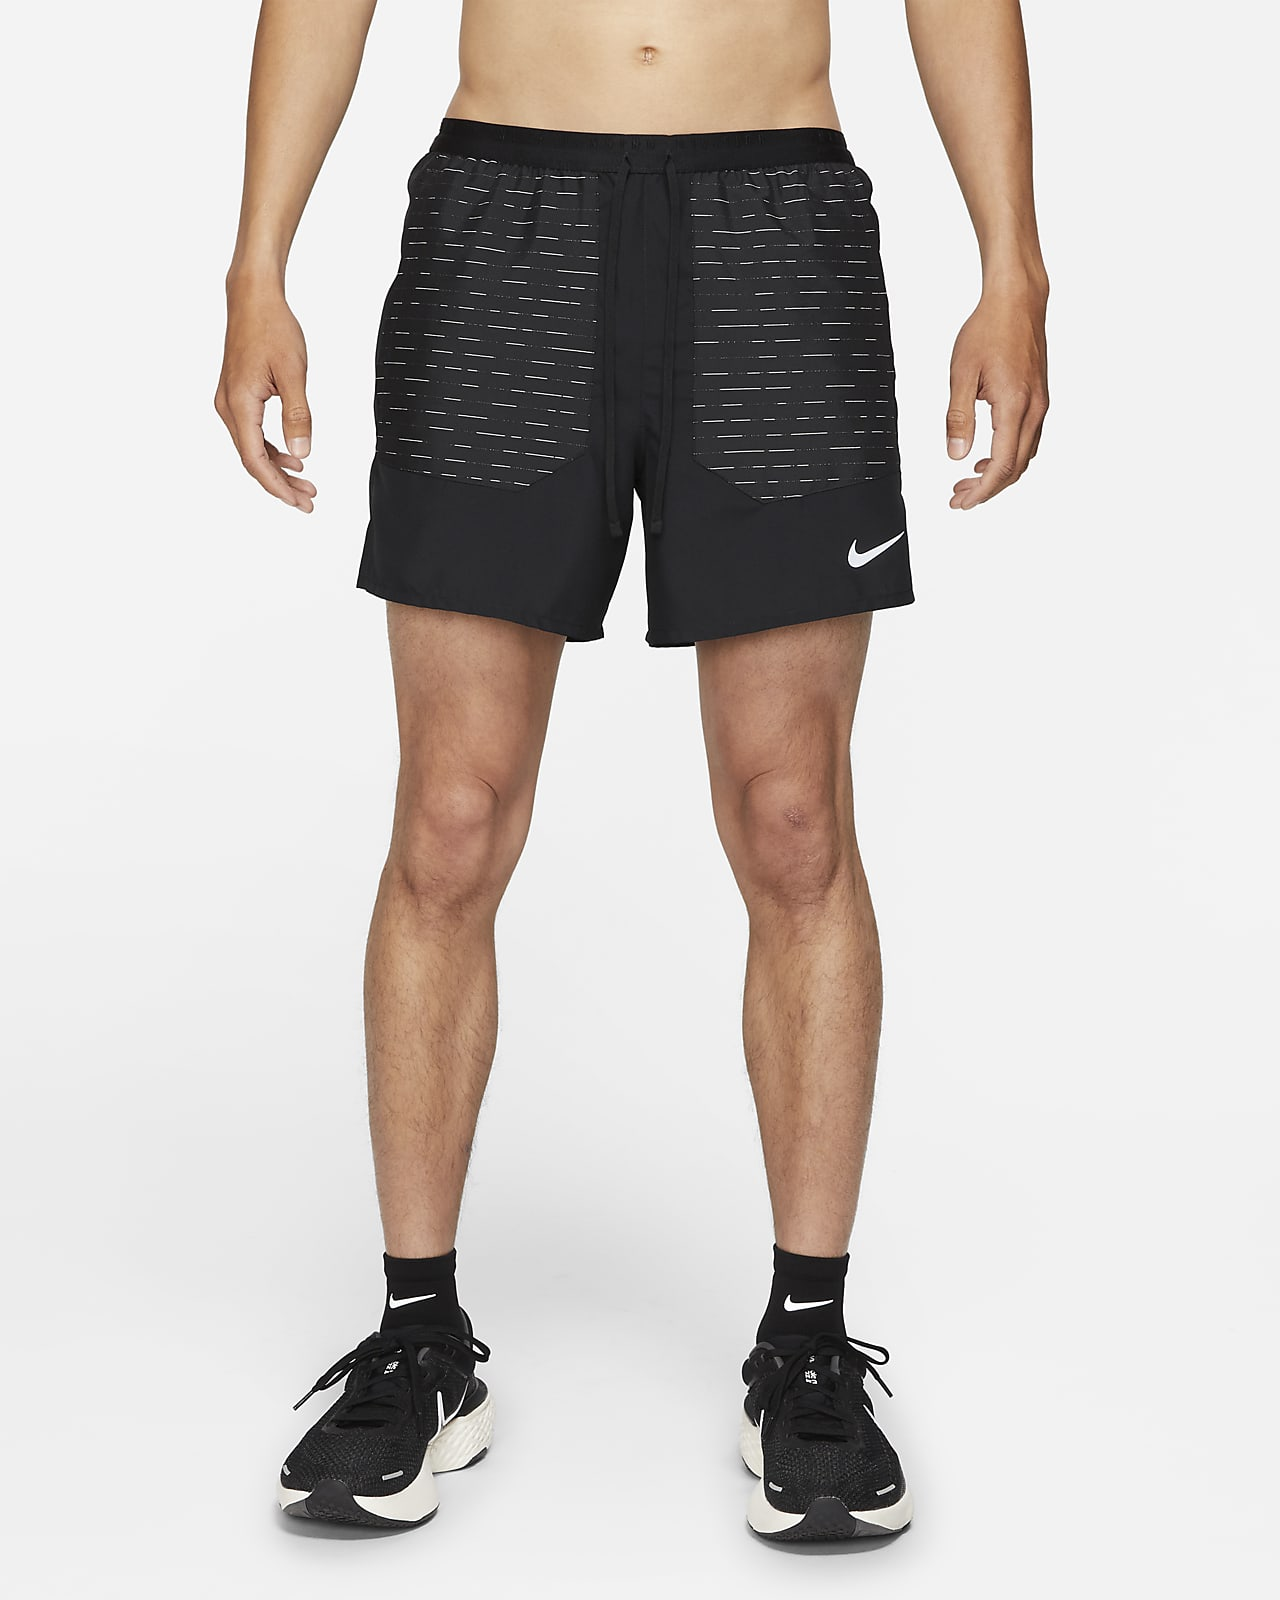 "Nike Dri-FIT Flex Stride Run Division Men's Brief-Lined 5"" Running Shorts"